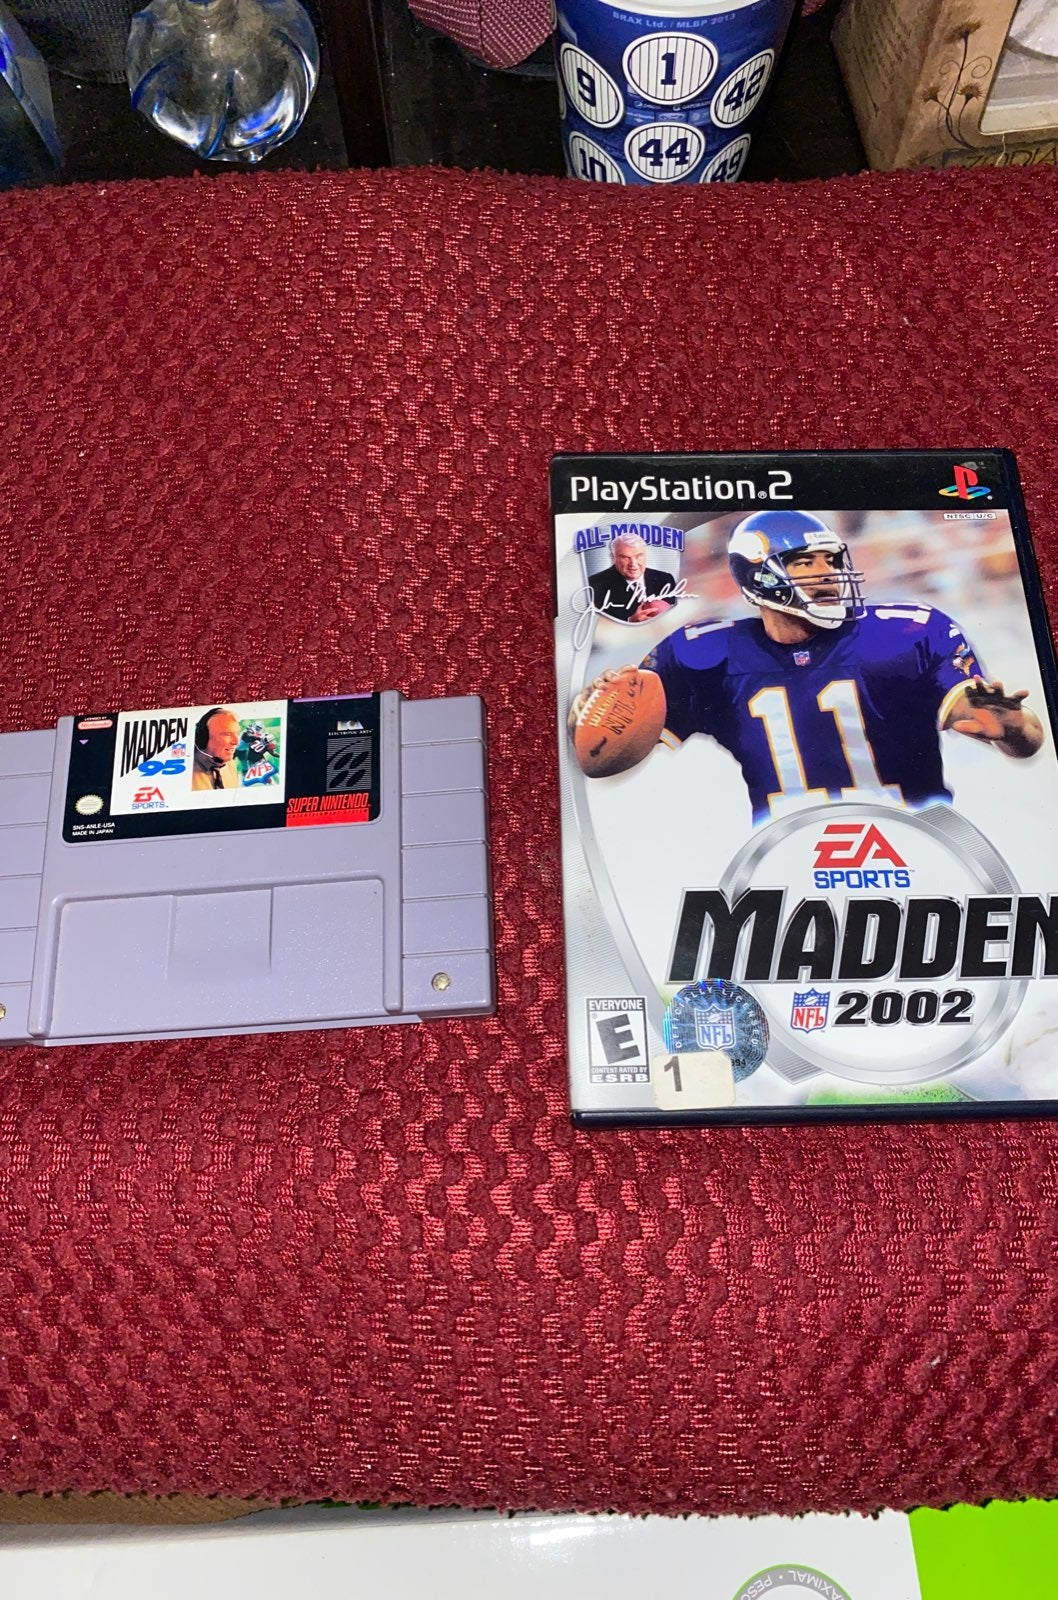 Madden video games